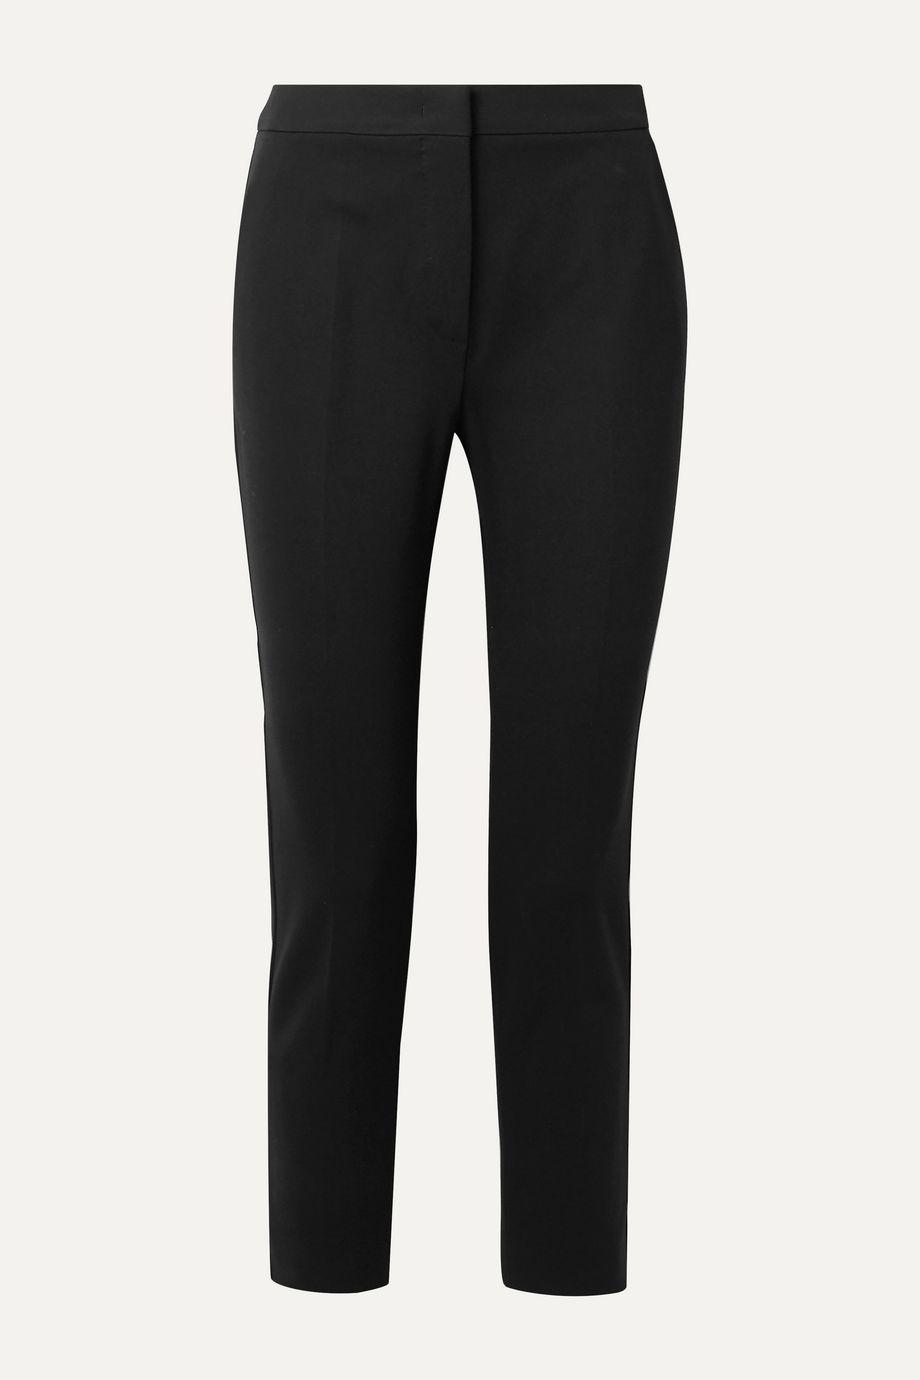 Max Mara Pegno cropped stretch-cady slim-leg pants